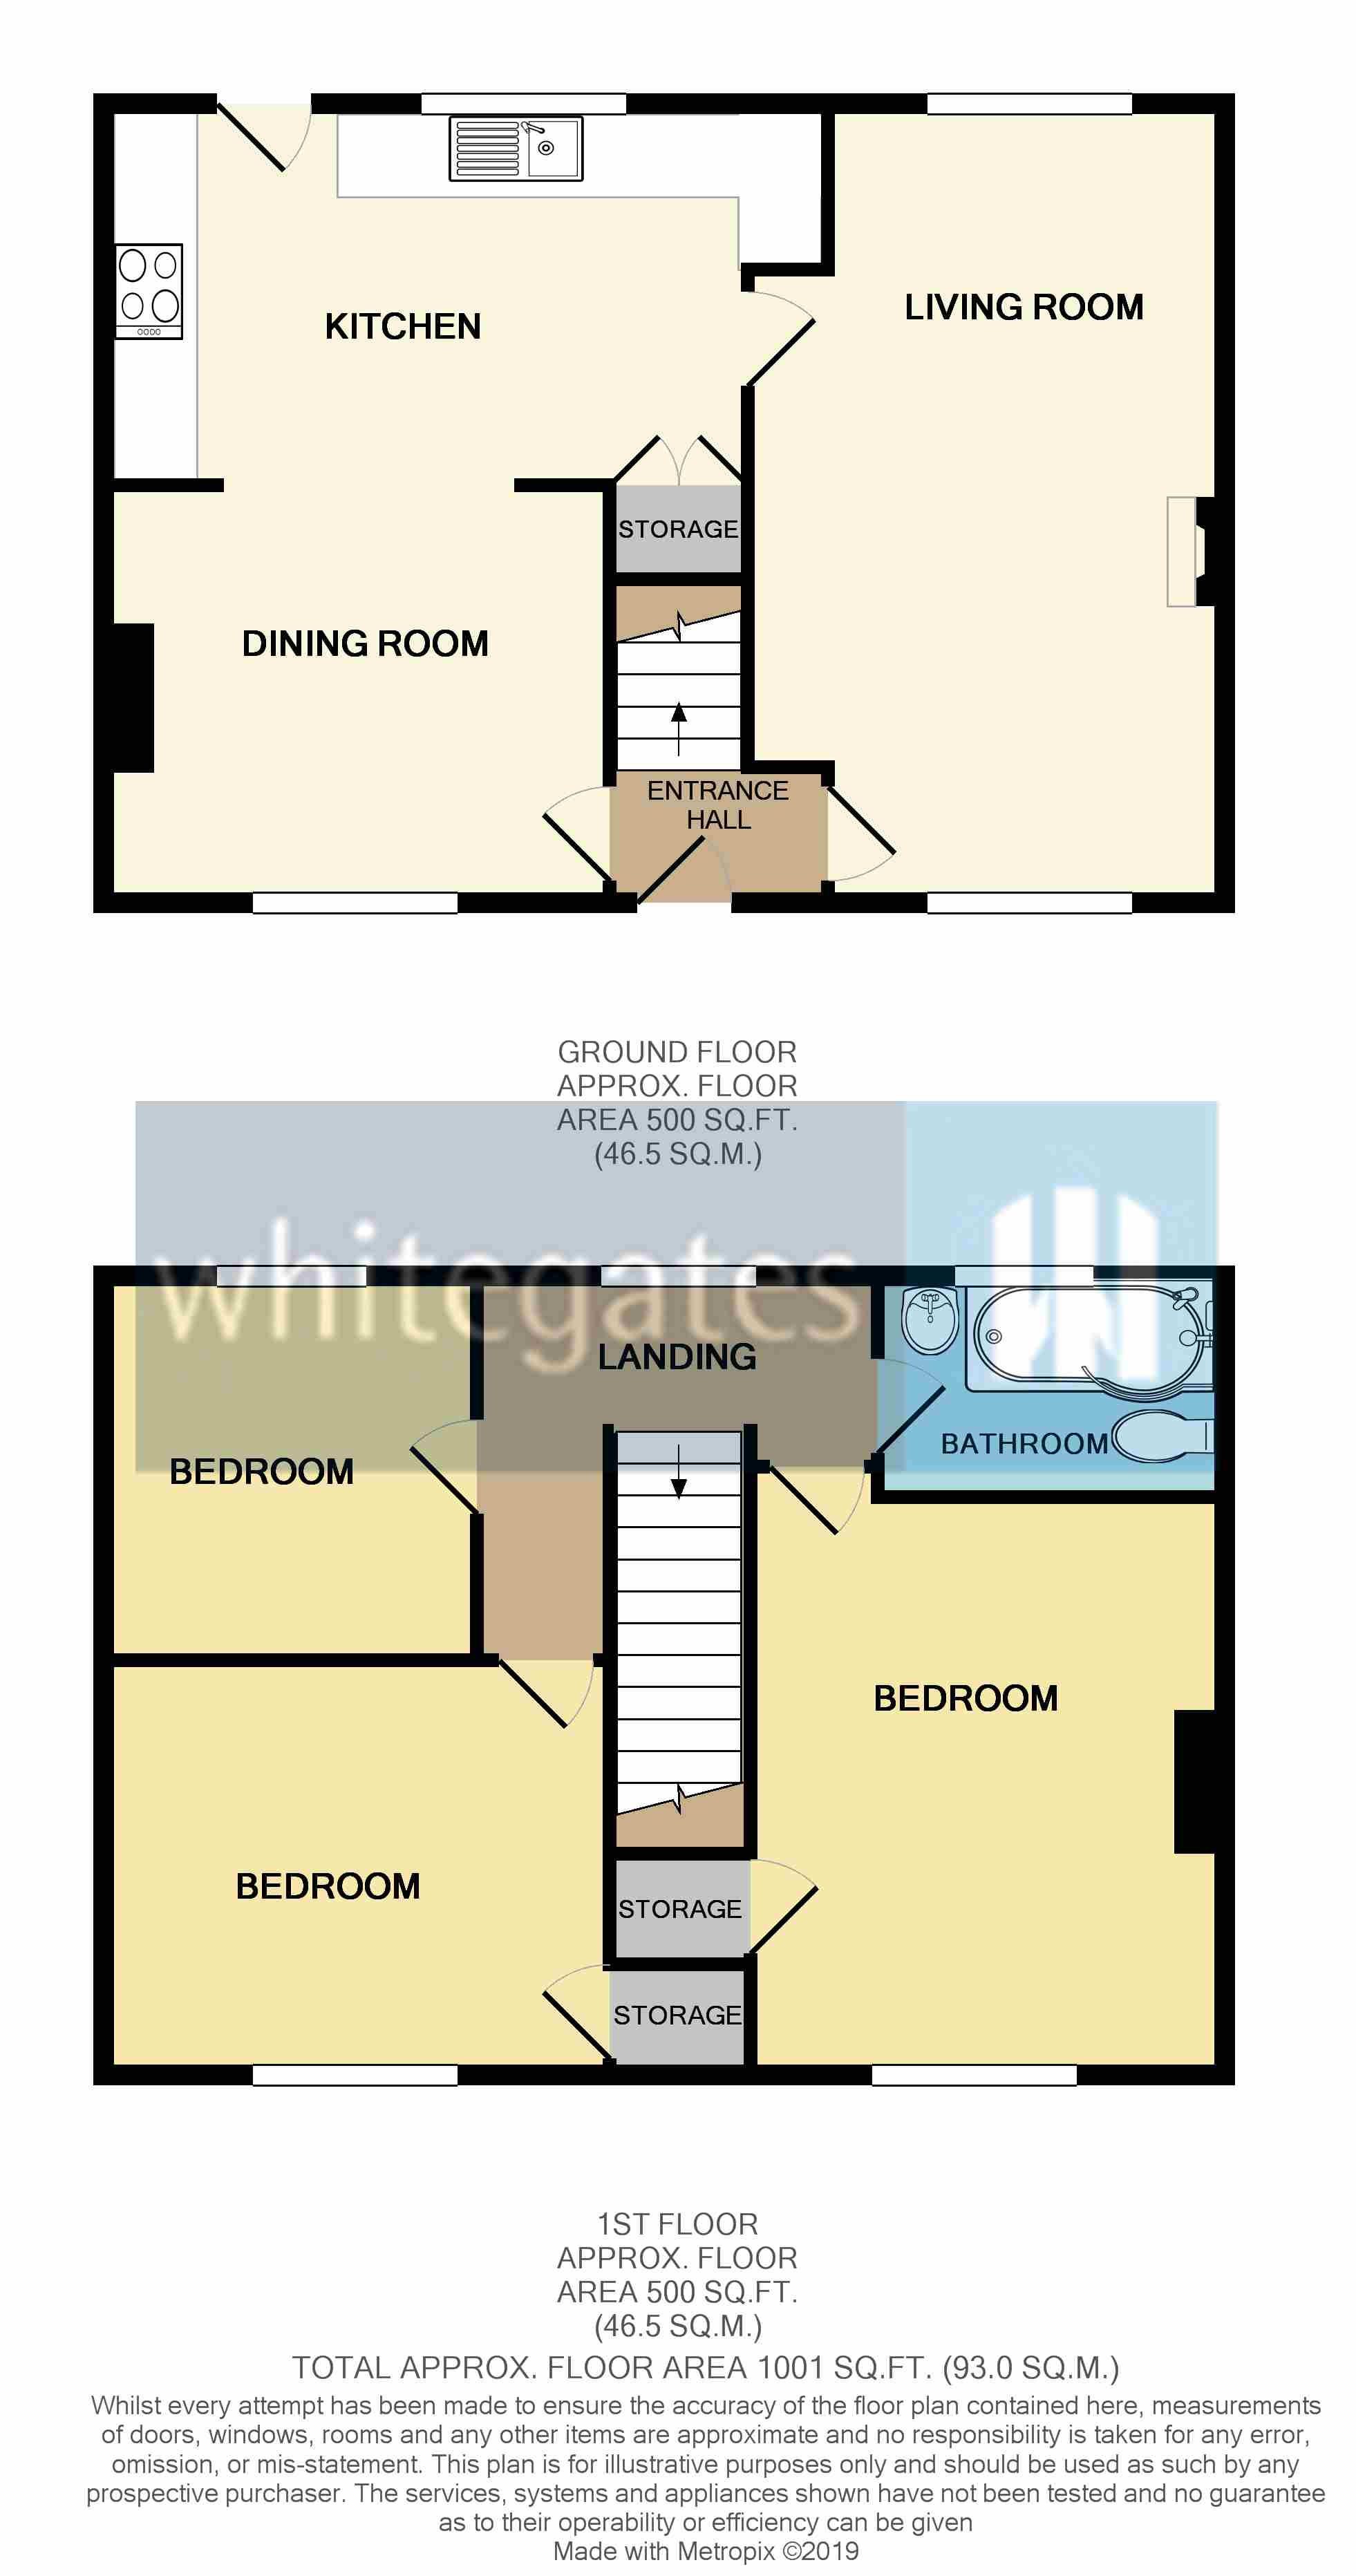 3 Bedrooms Semi-detached house for sale in Hamel Rise, Hemsworth, Pontefract, West Yorkshire WF9